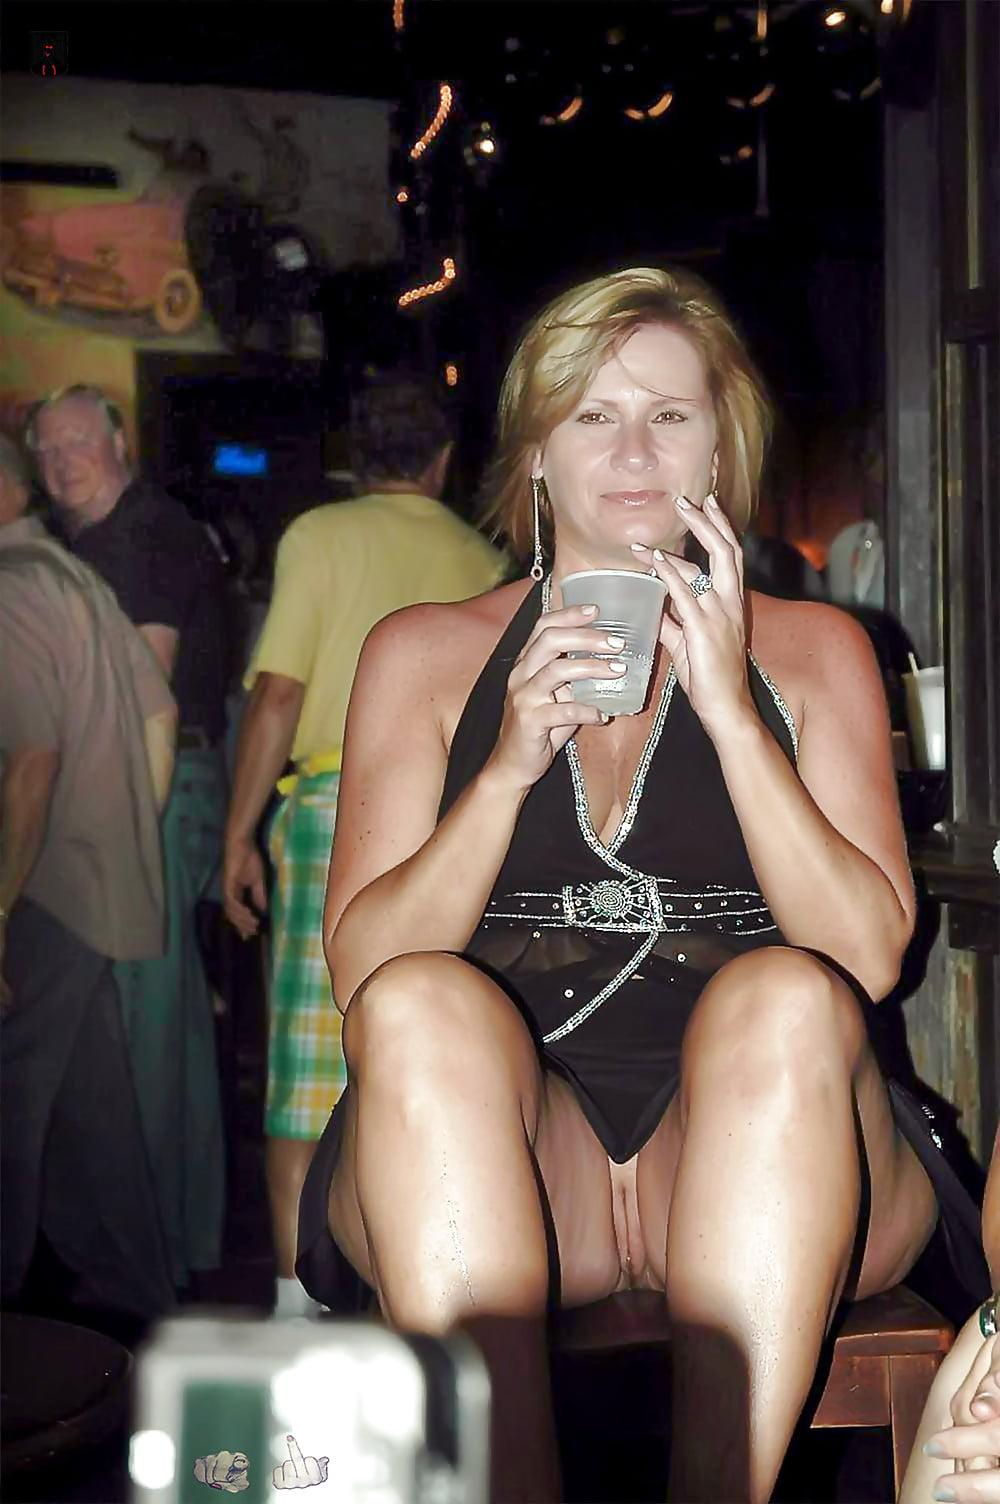 Free drunk female exposed photos #2